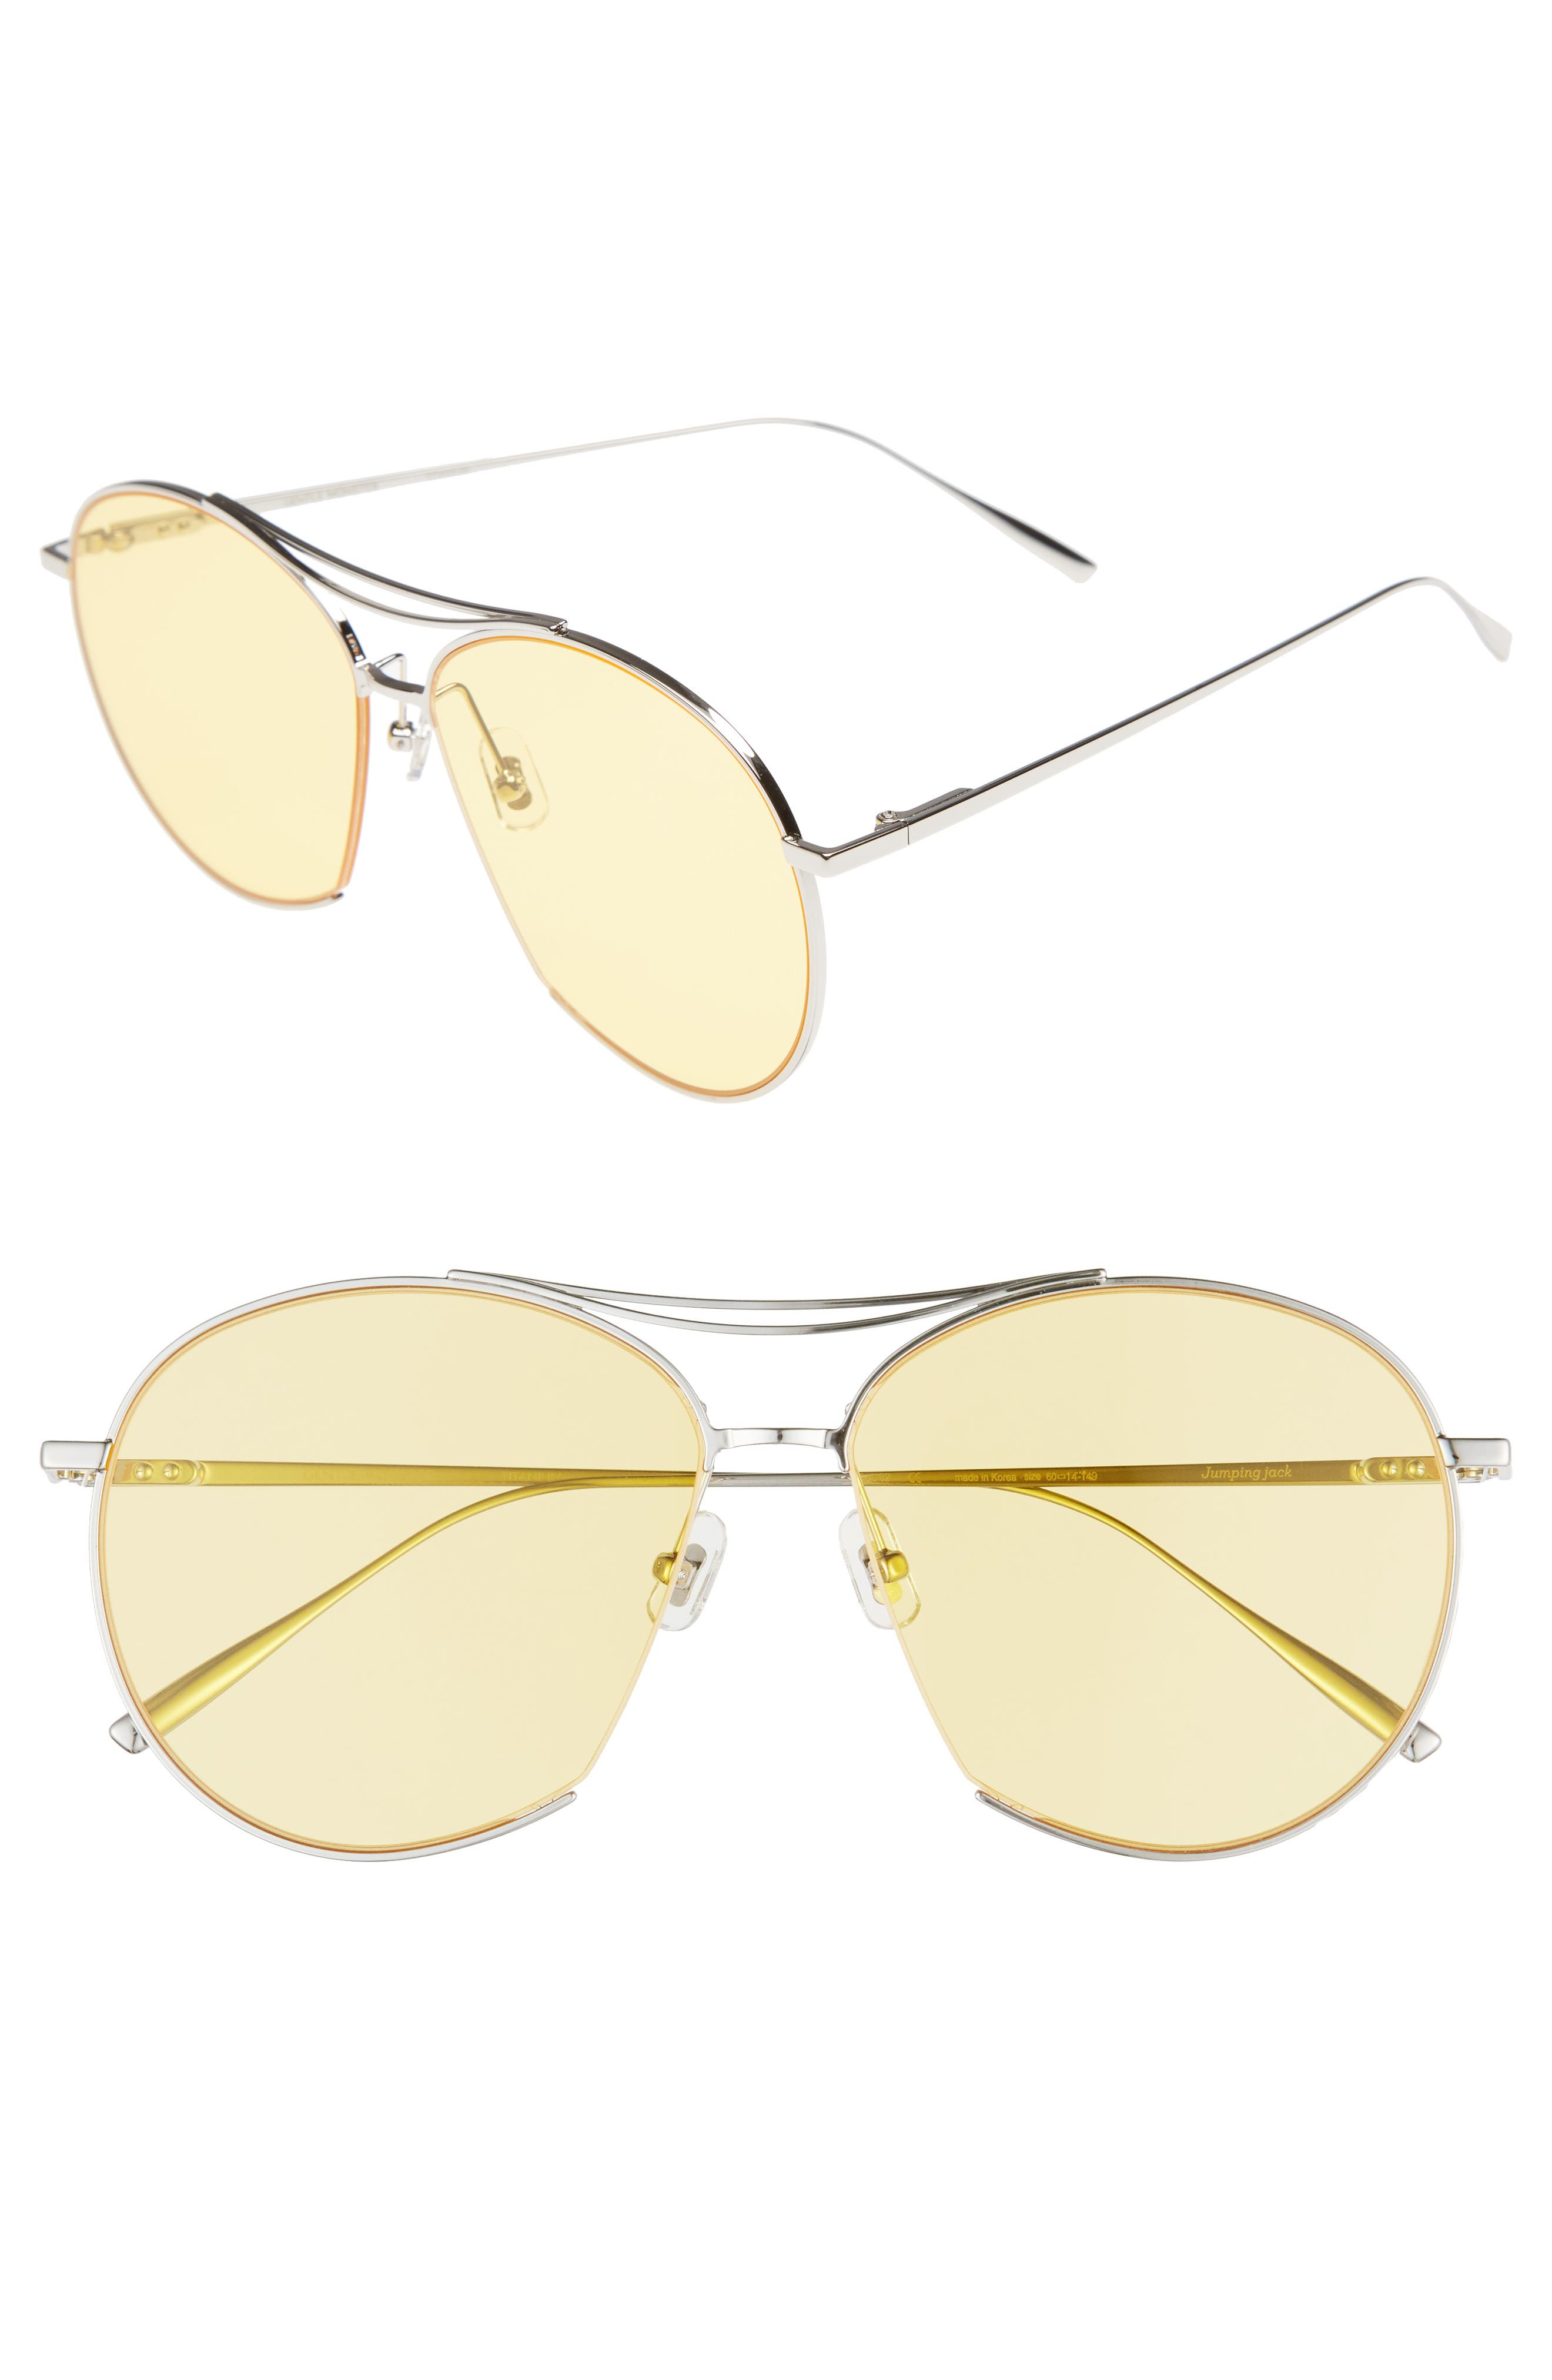 Jumping Jack 60mm Aviator Sunglasses,                             Main thumbnail 1, color,                             041